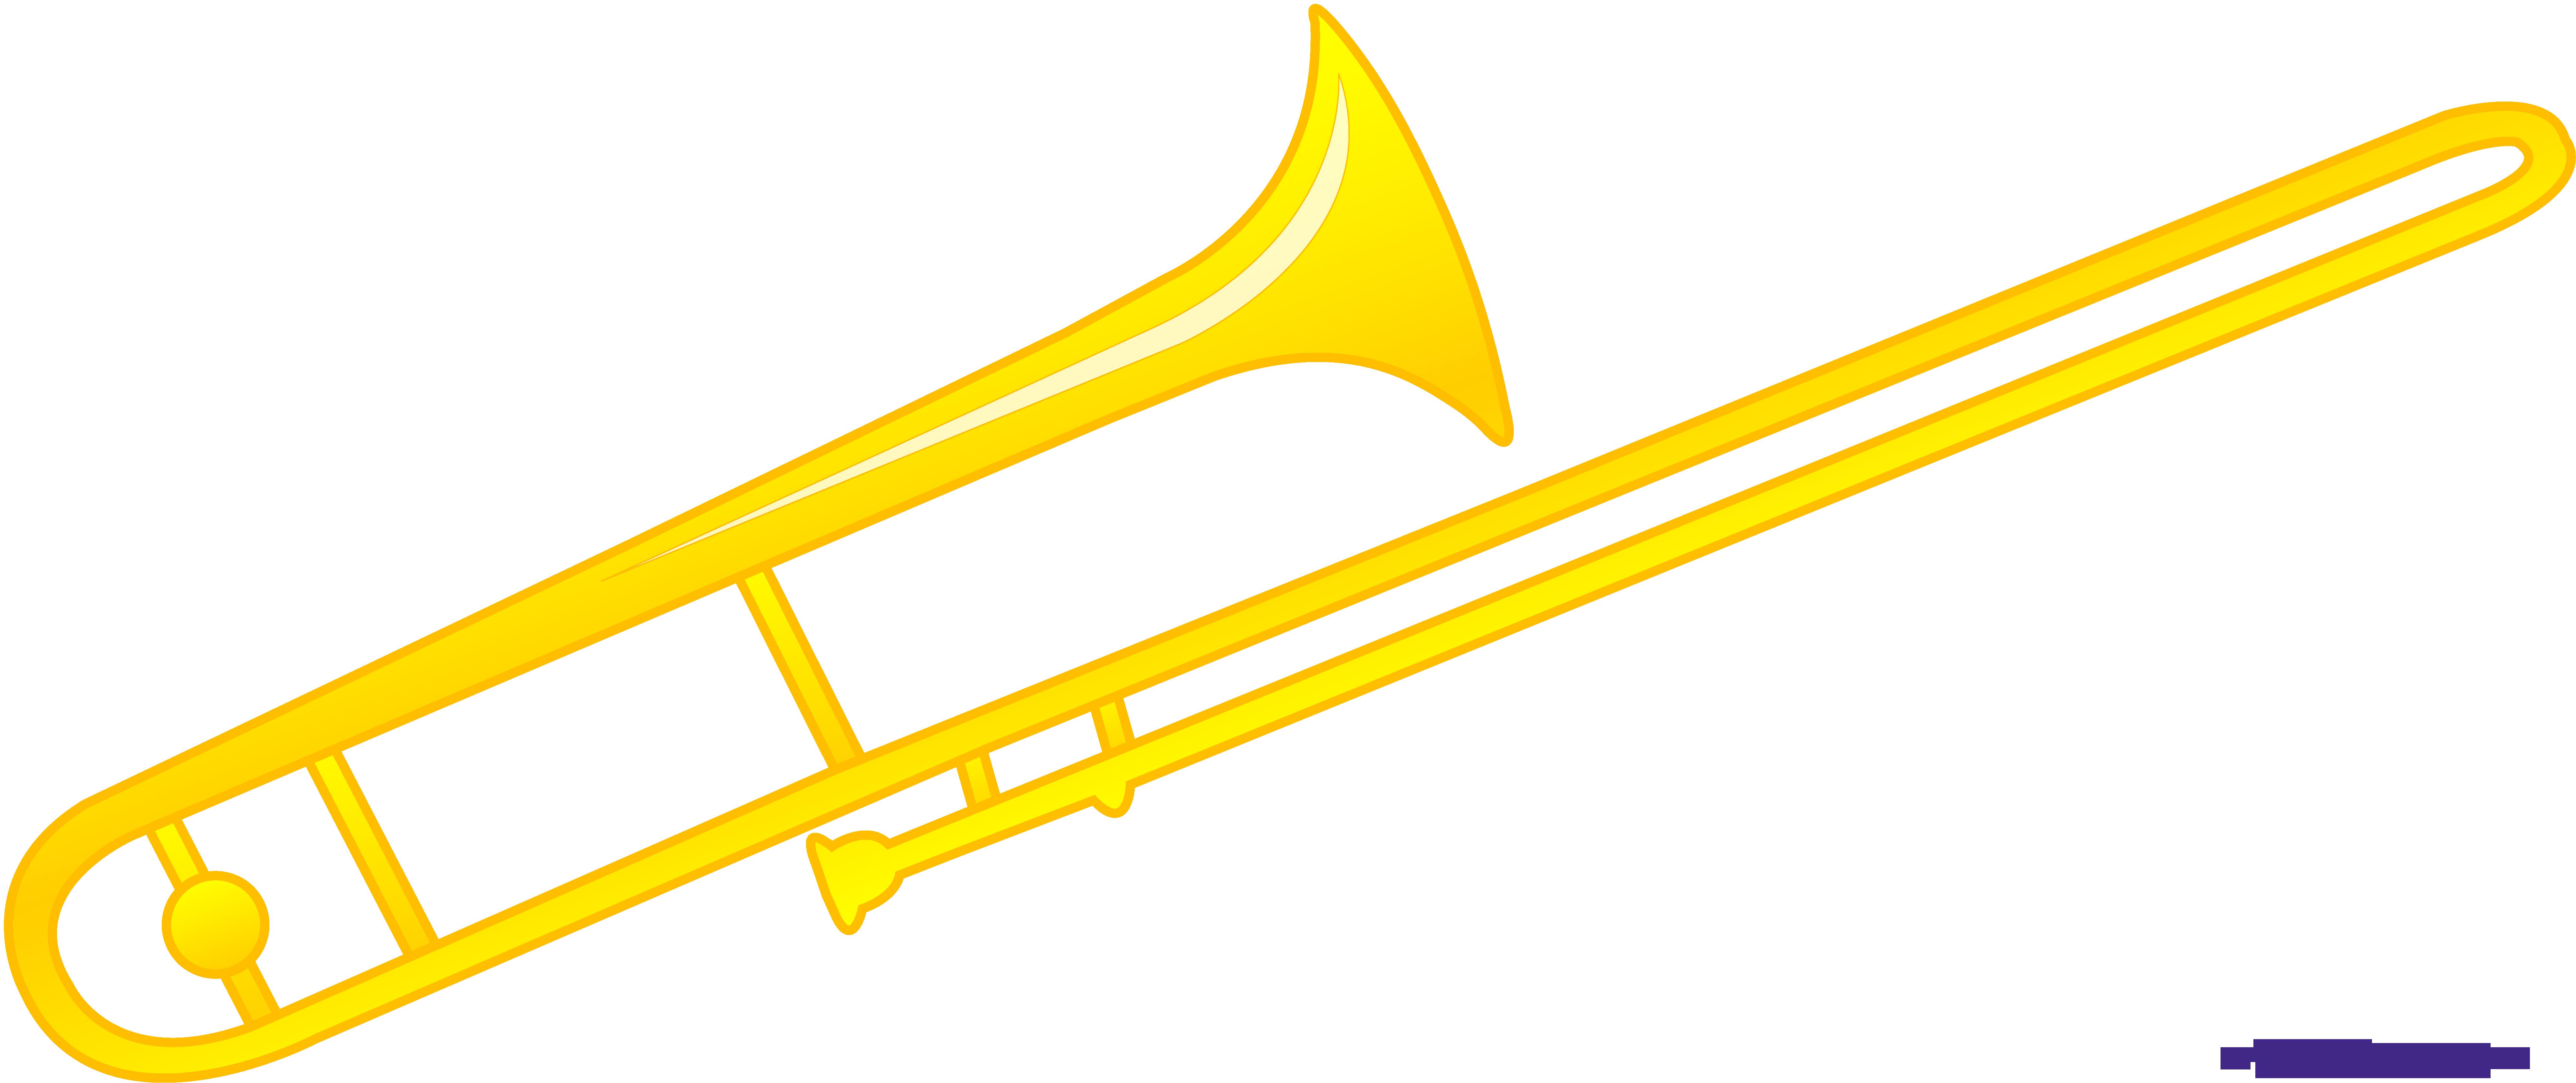 trombone clipart sweet clip art rh m sweetclipart com clipart trombone papier trombone clipart black and white